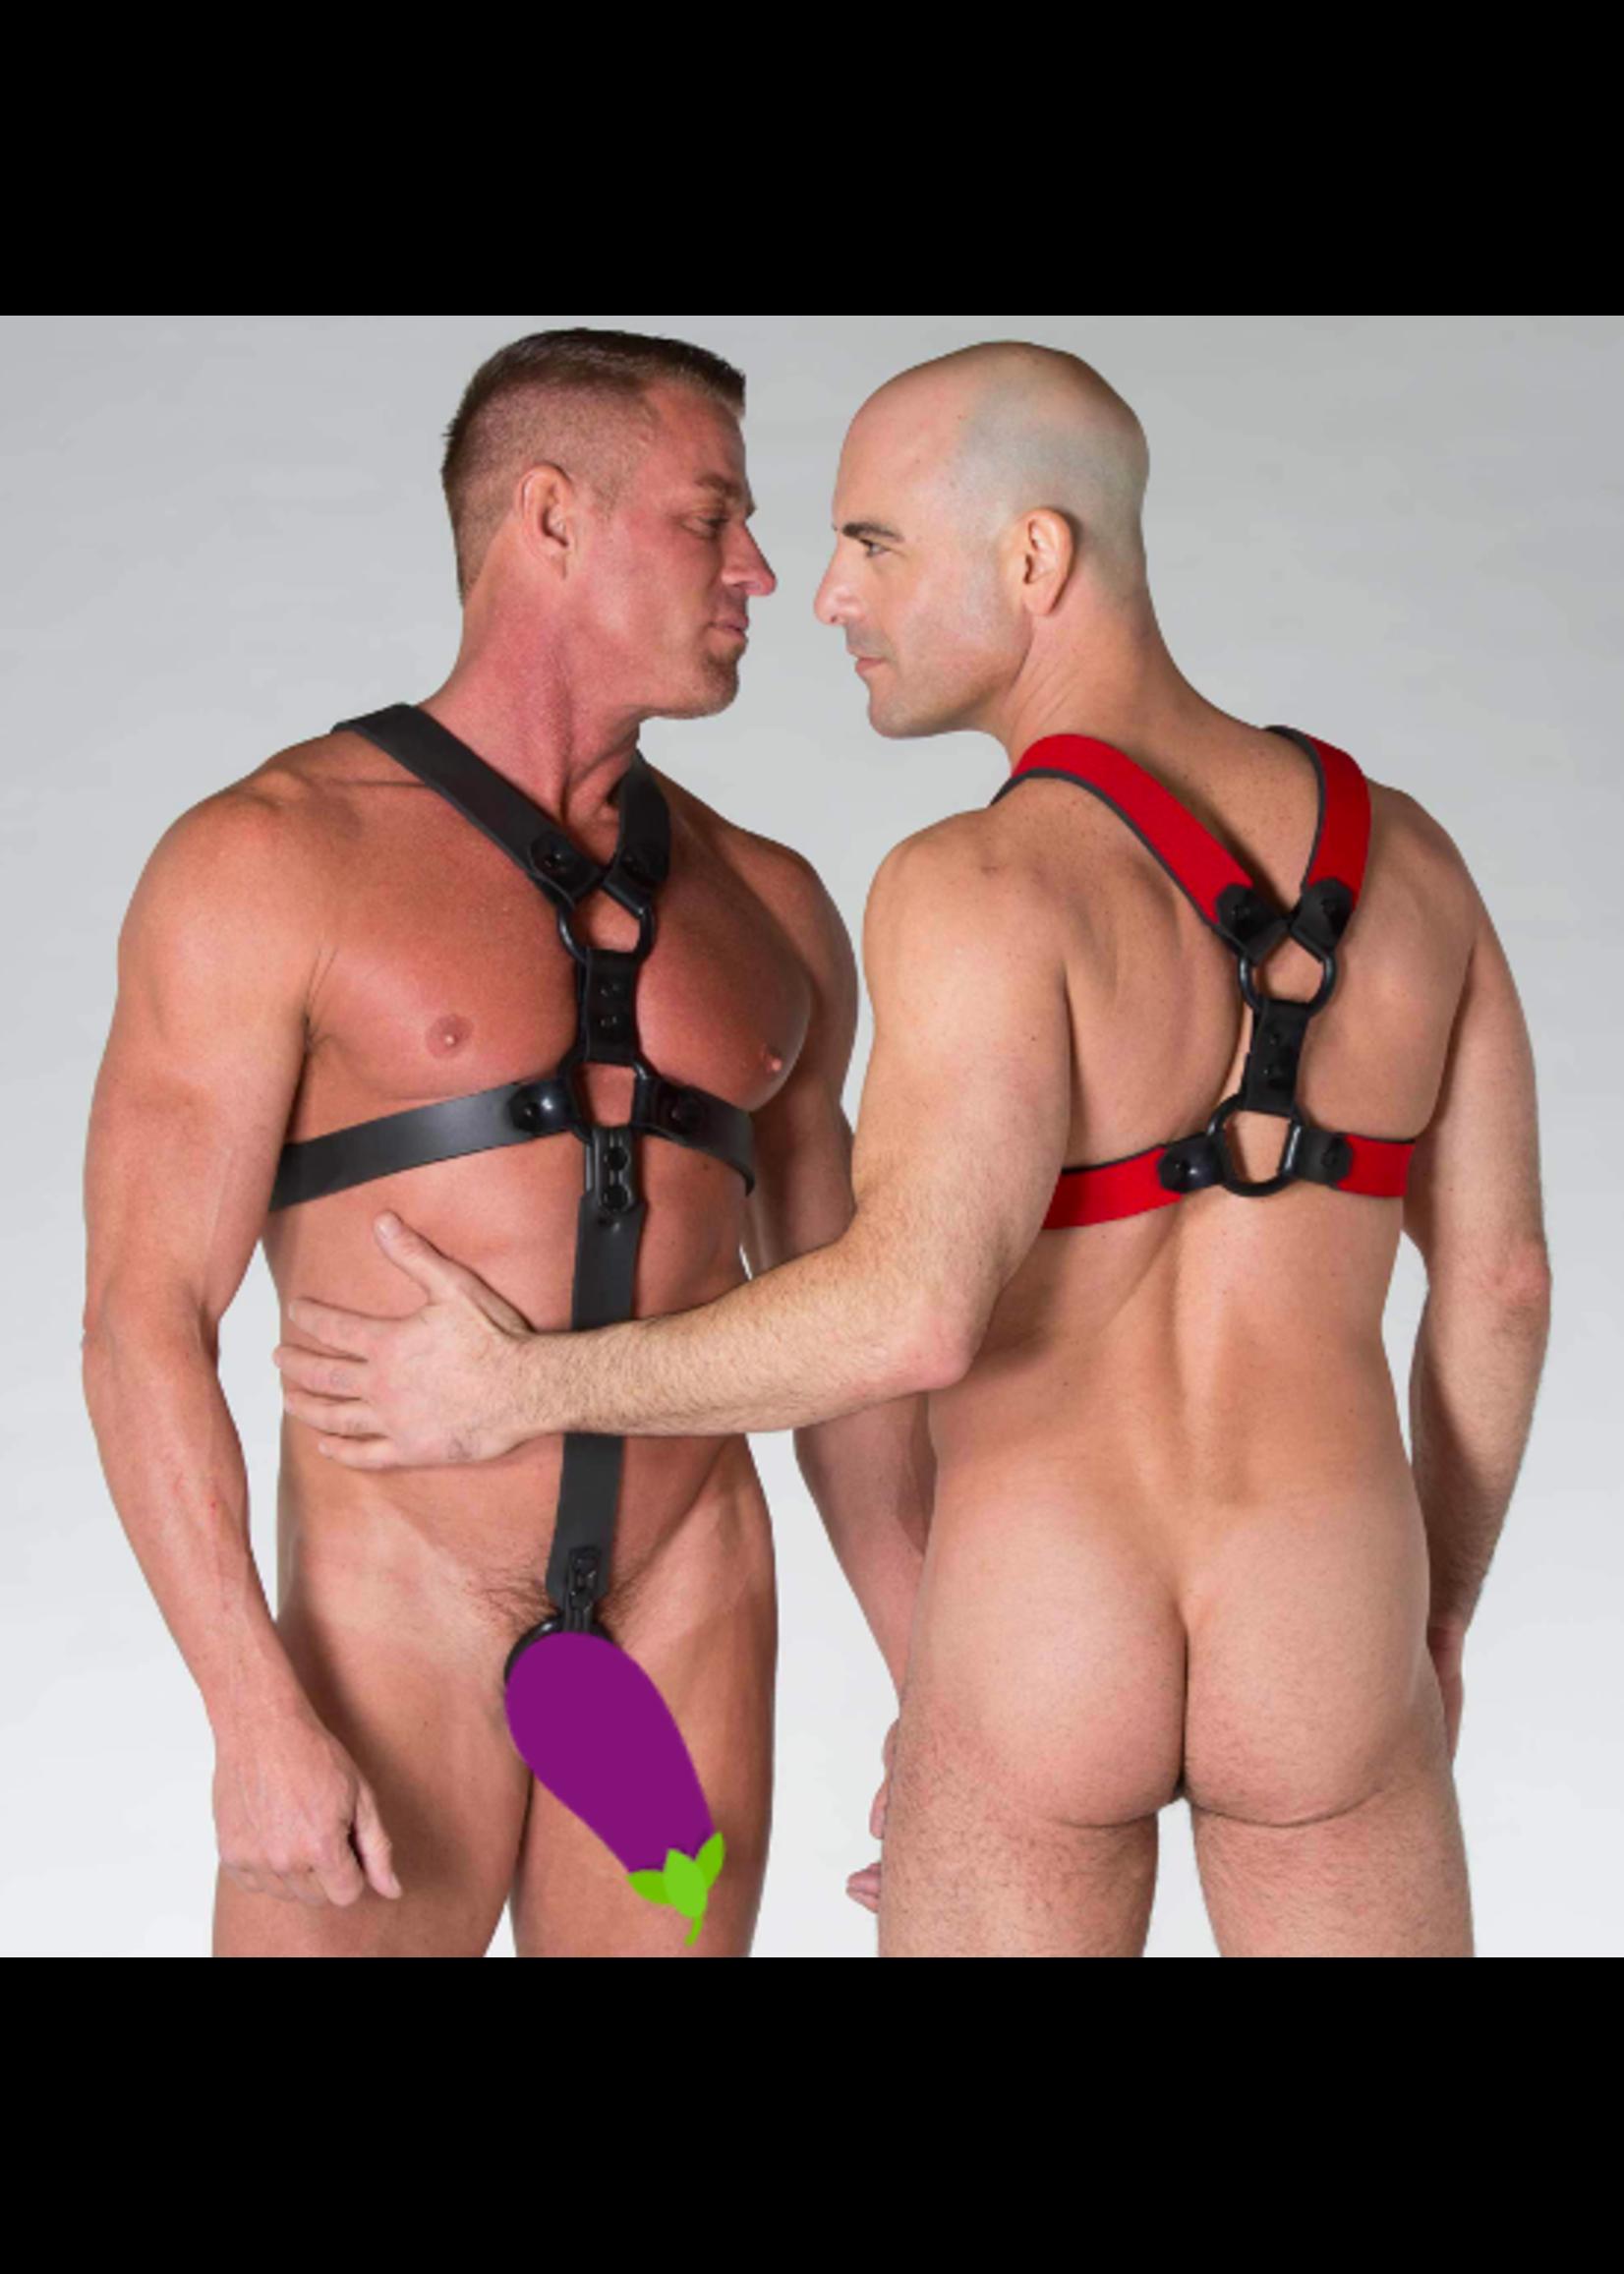 665 Leather 665 NeoSkin Neoprene 5 Strap Harness